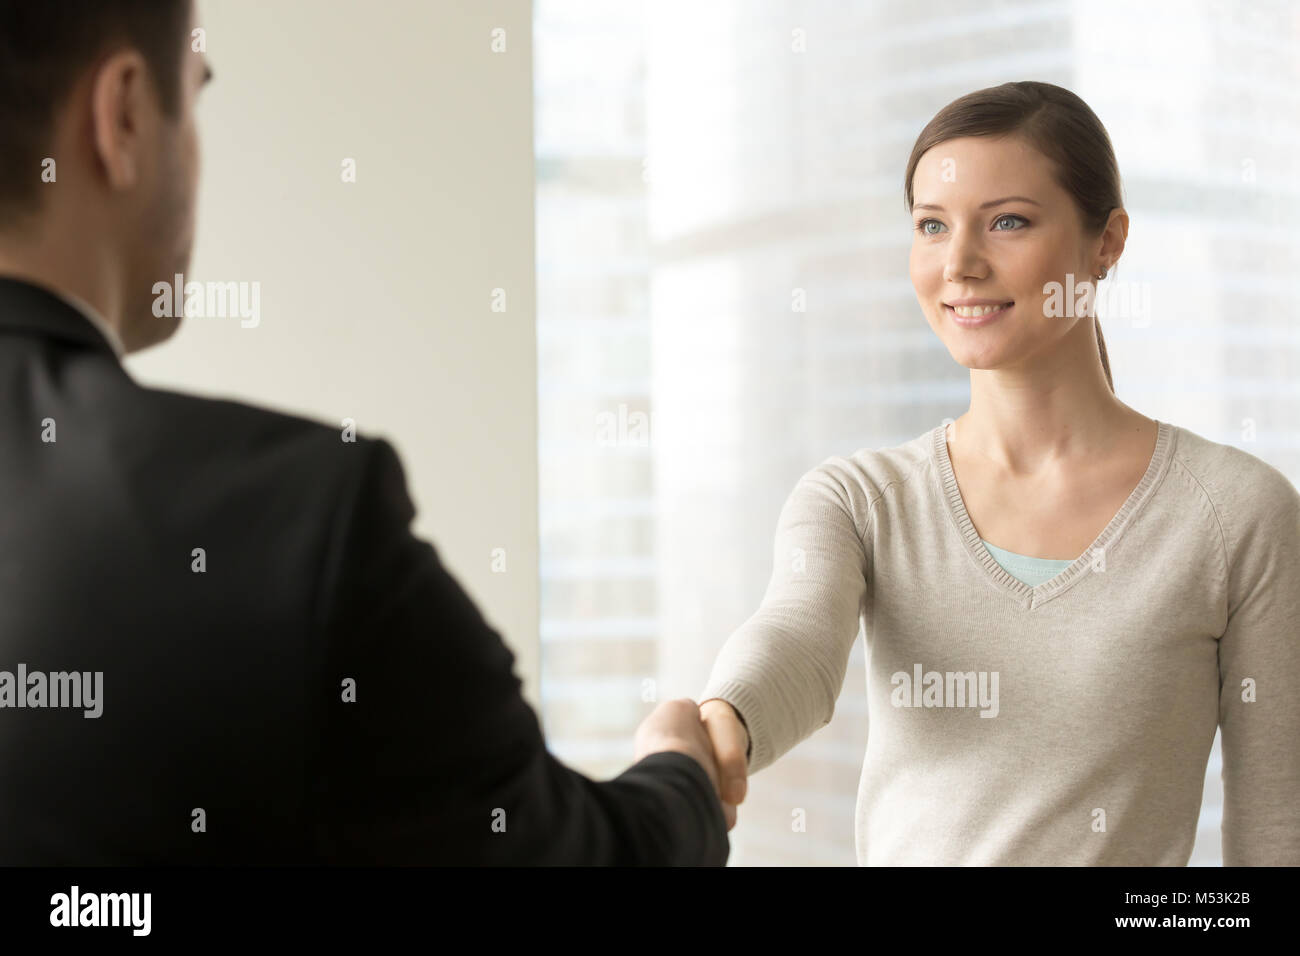 Attractive female employee handshaking with boss - Stock Image